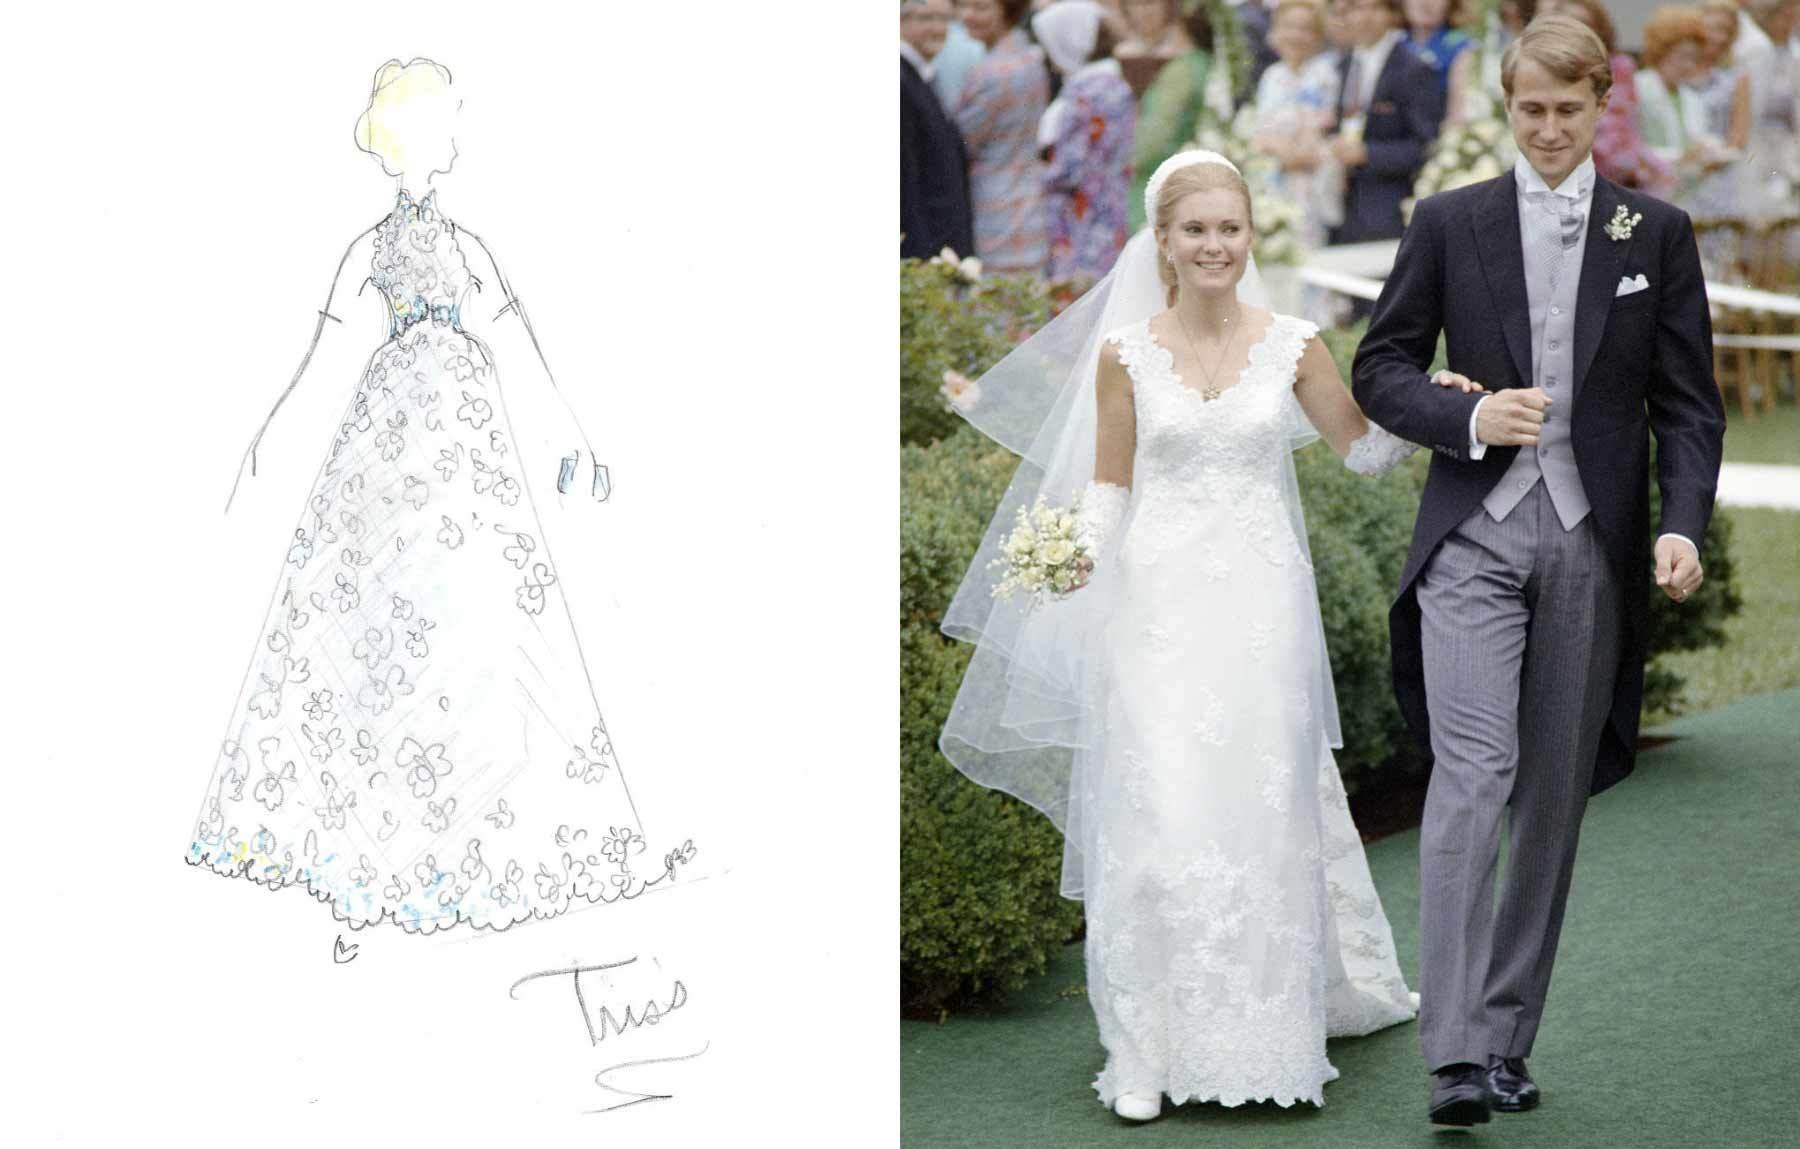 Burbidge's sketch design for Tricia Nixon's wedding gown